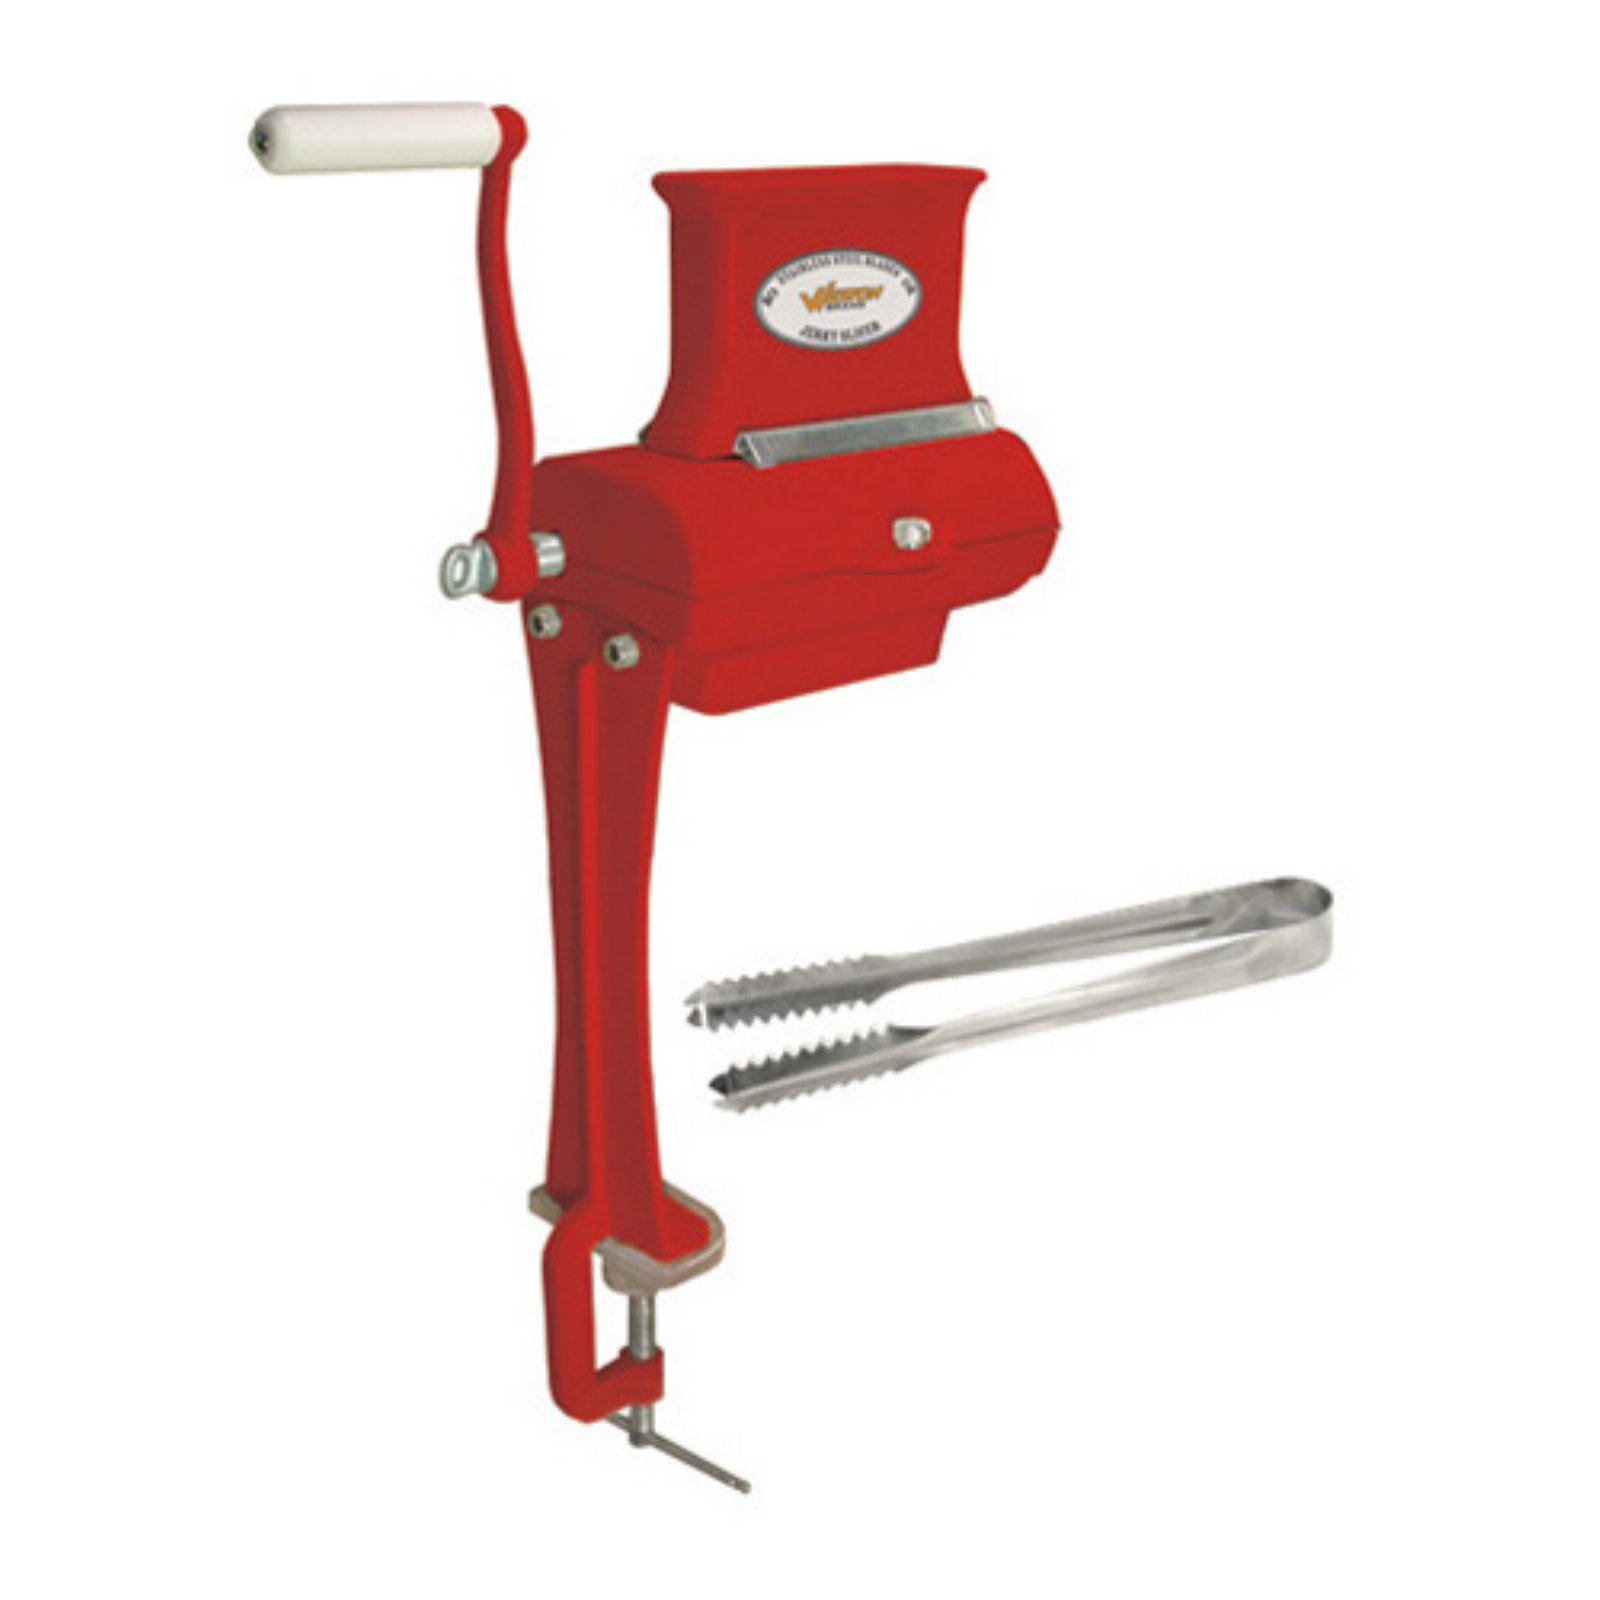 Weston Manual Single-Support Jerky Slicer